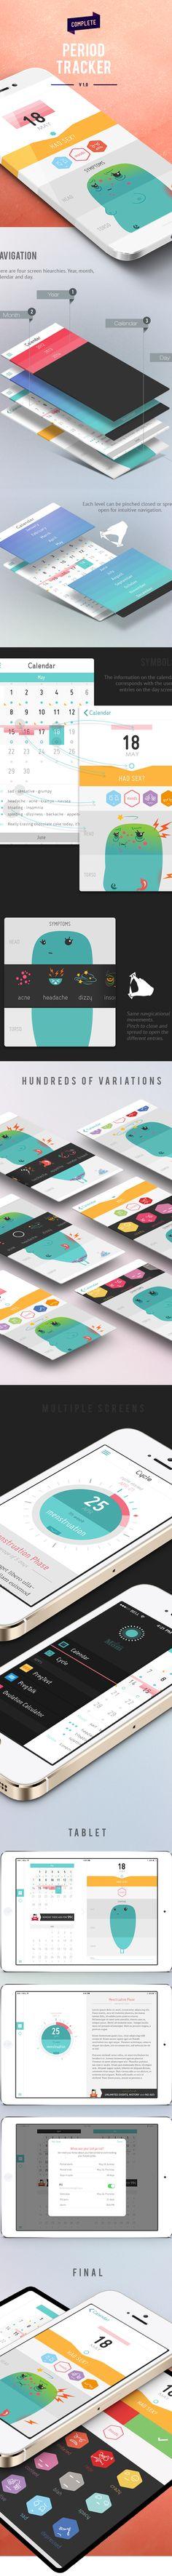 Period Tracker - iPhone App on Behance